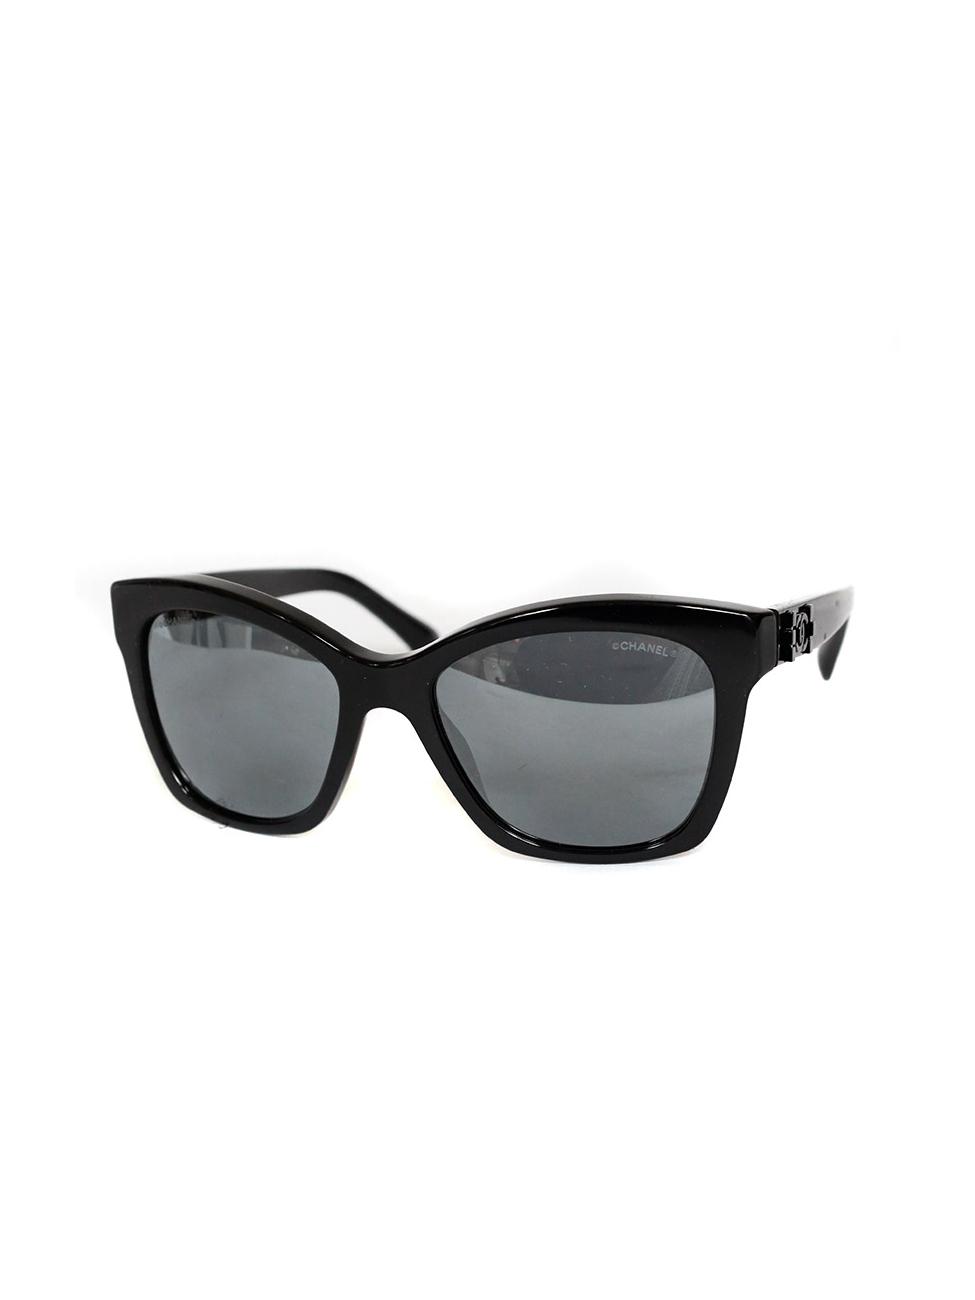 67e8571ef9 Louise Paris - CHANEL Black frame 5313 sunglasses Retail price €245 NEW